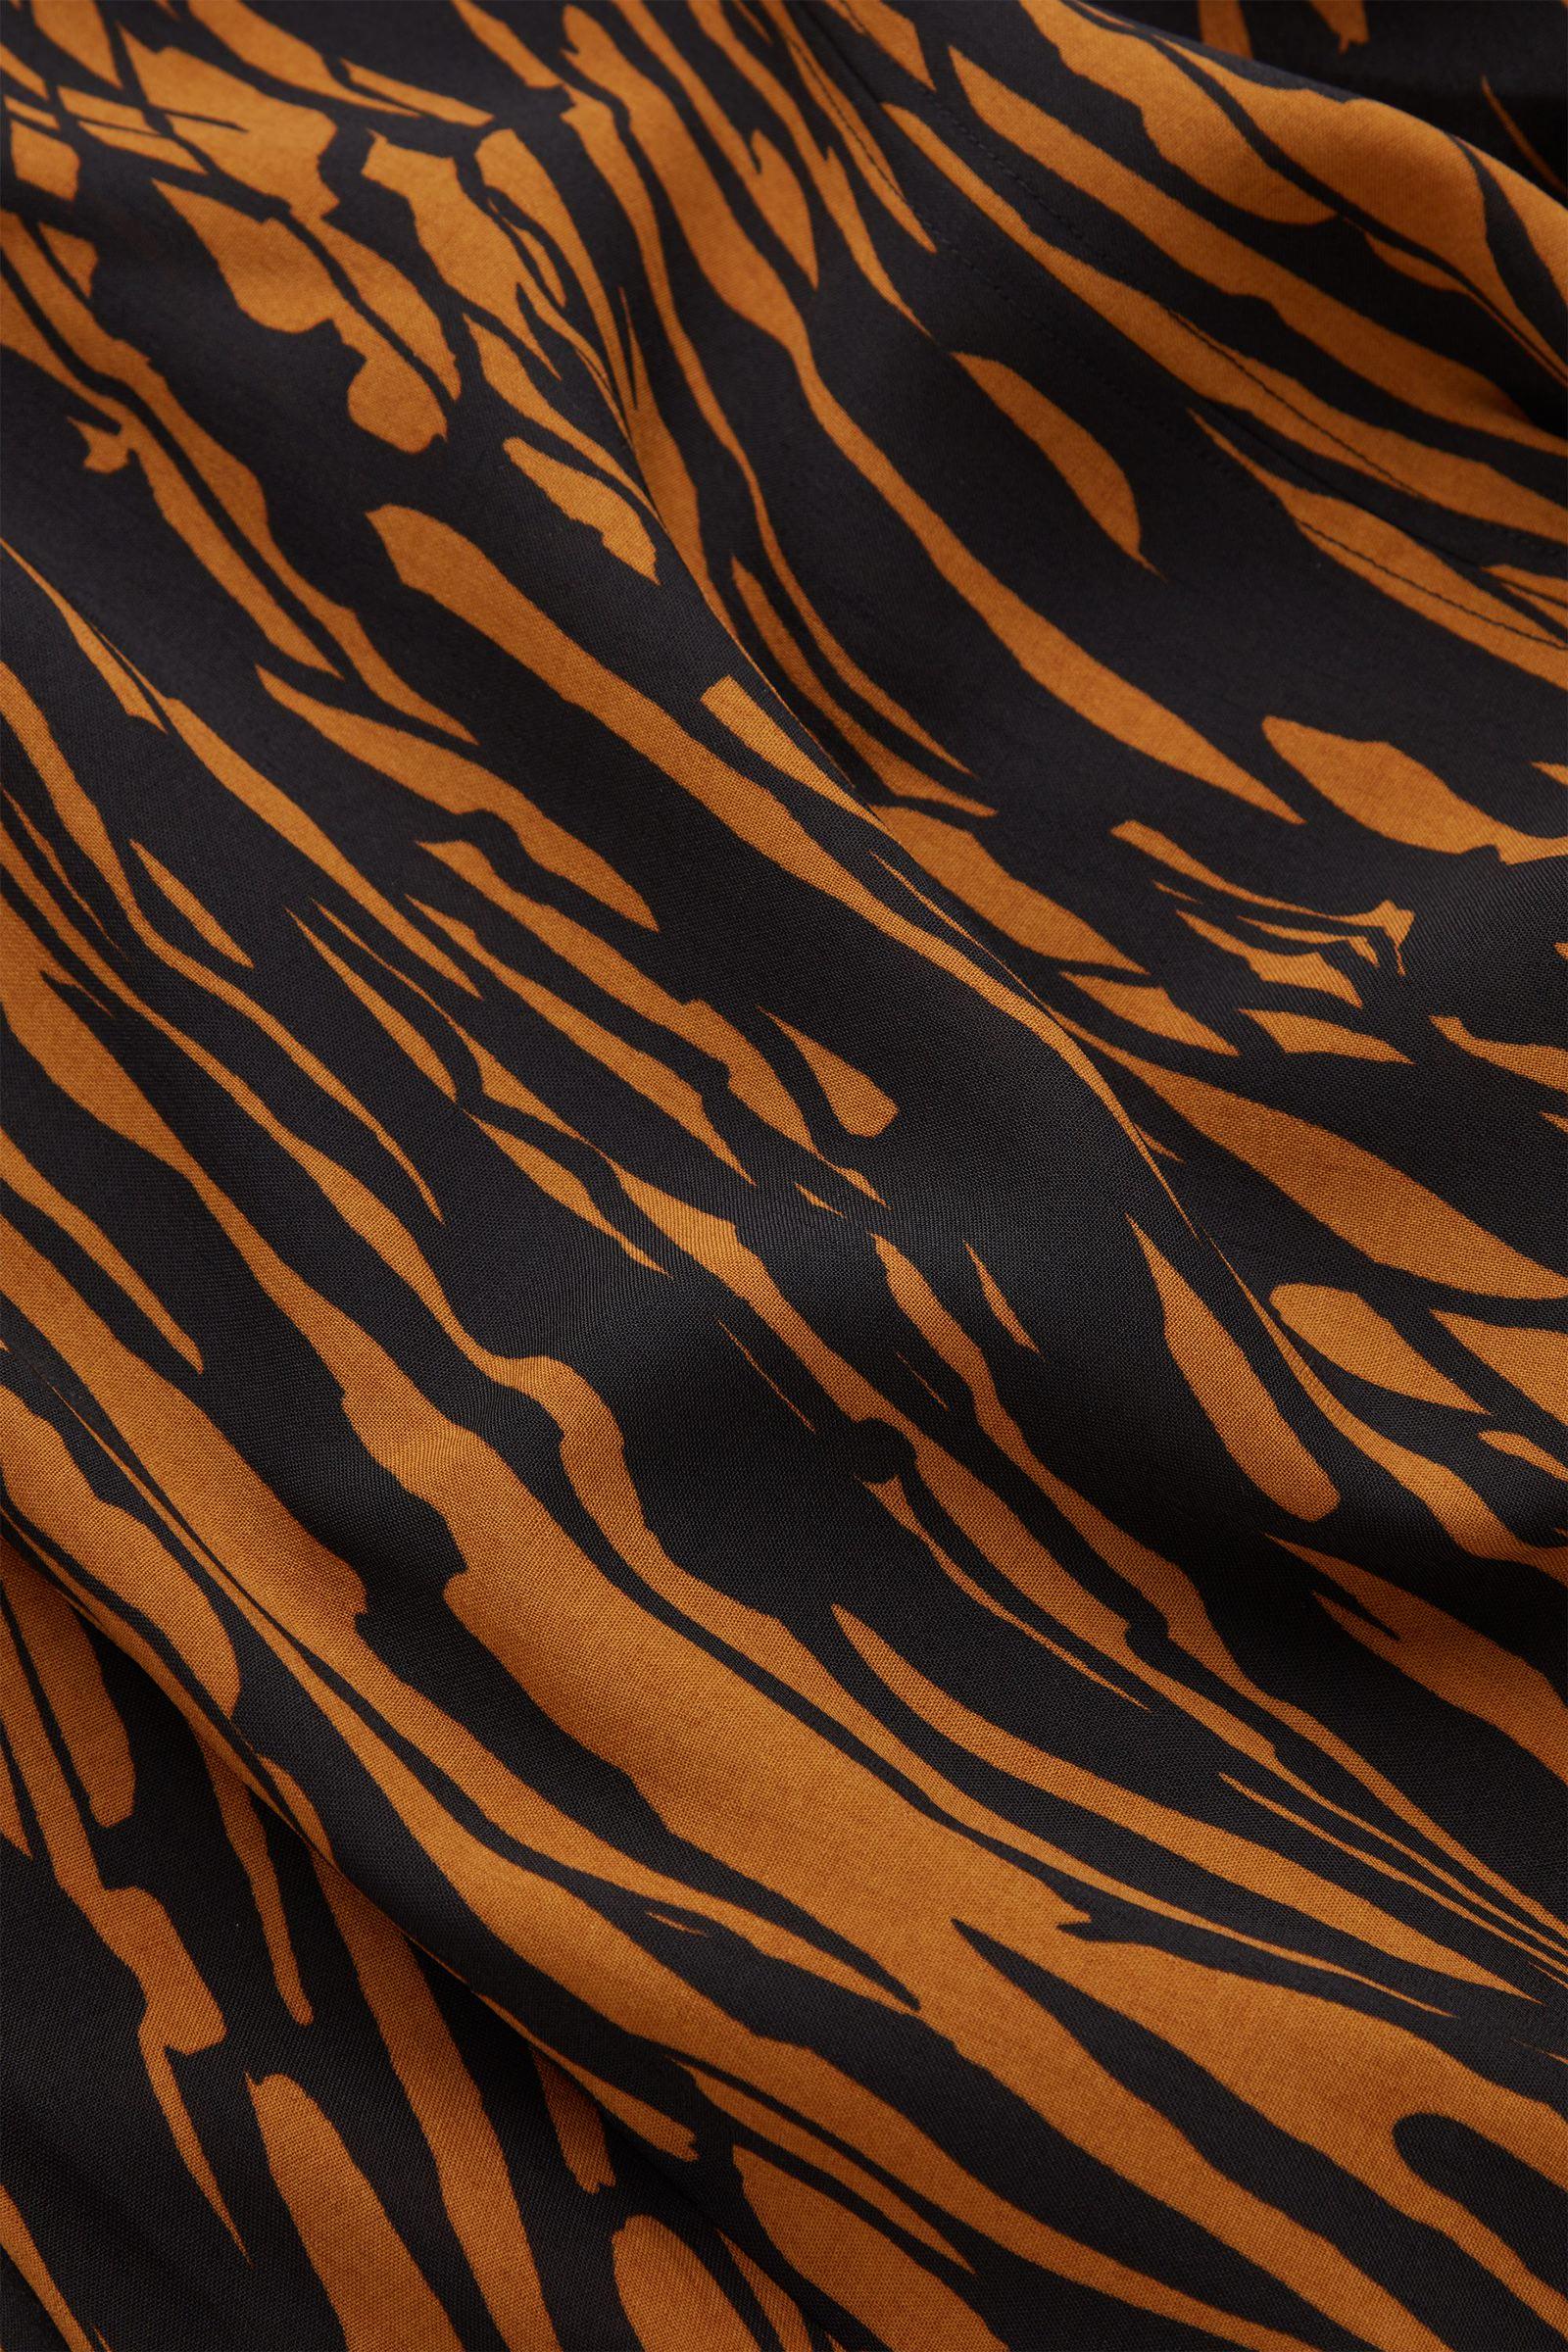 COS 프린티드 보우 디테일 드레스의 블랙 / 브라운컬러 Detail입니다.